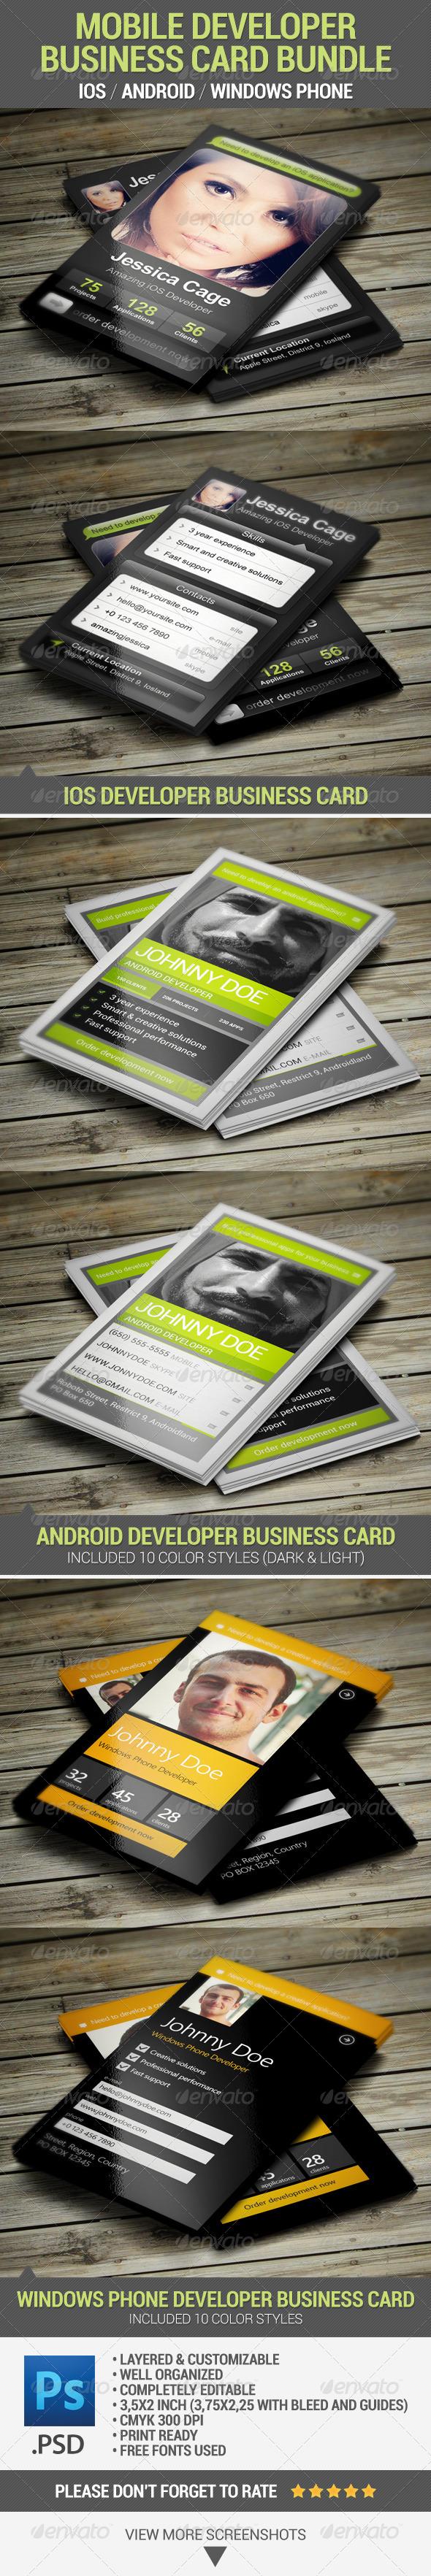 GraphicRiver Mobile Developer Business Card Bundle 5218112